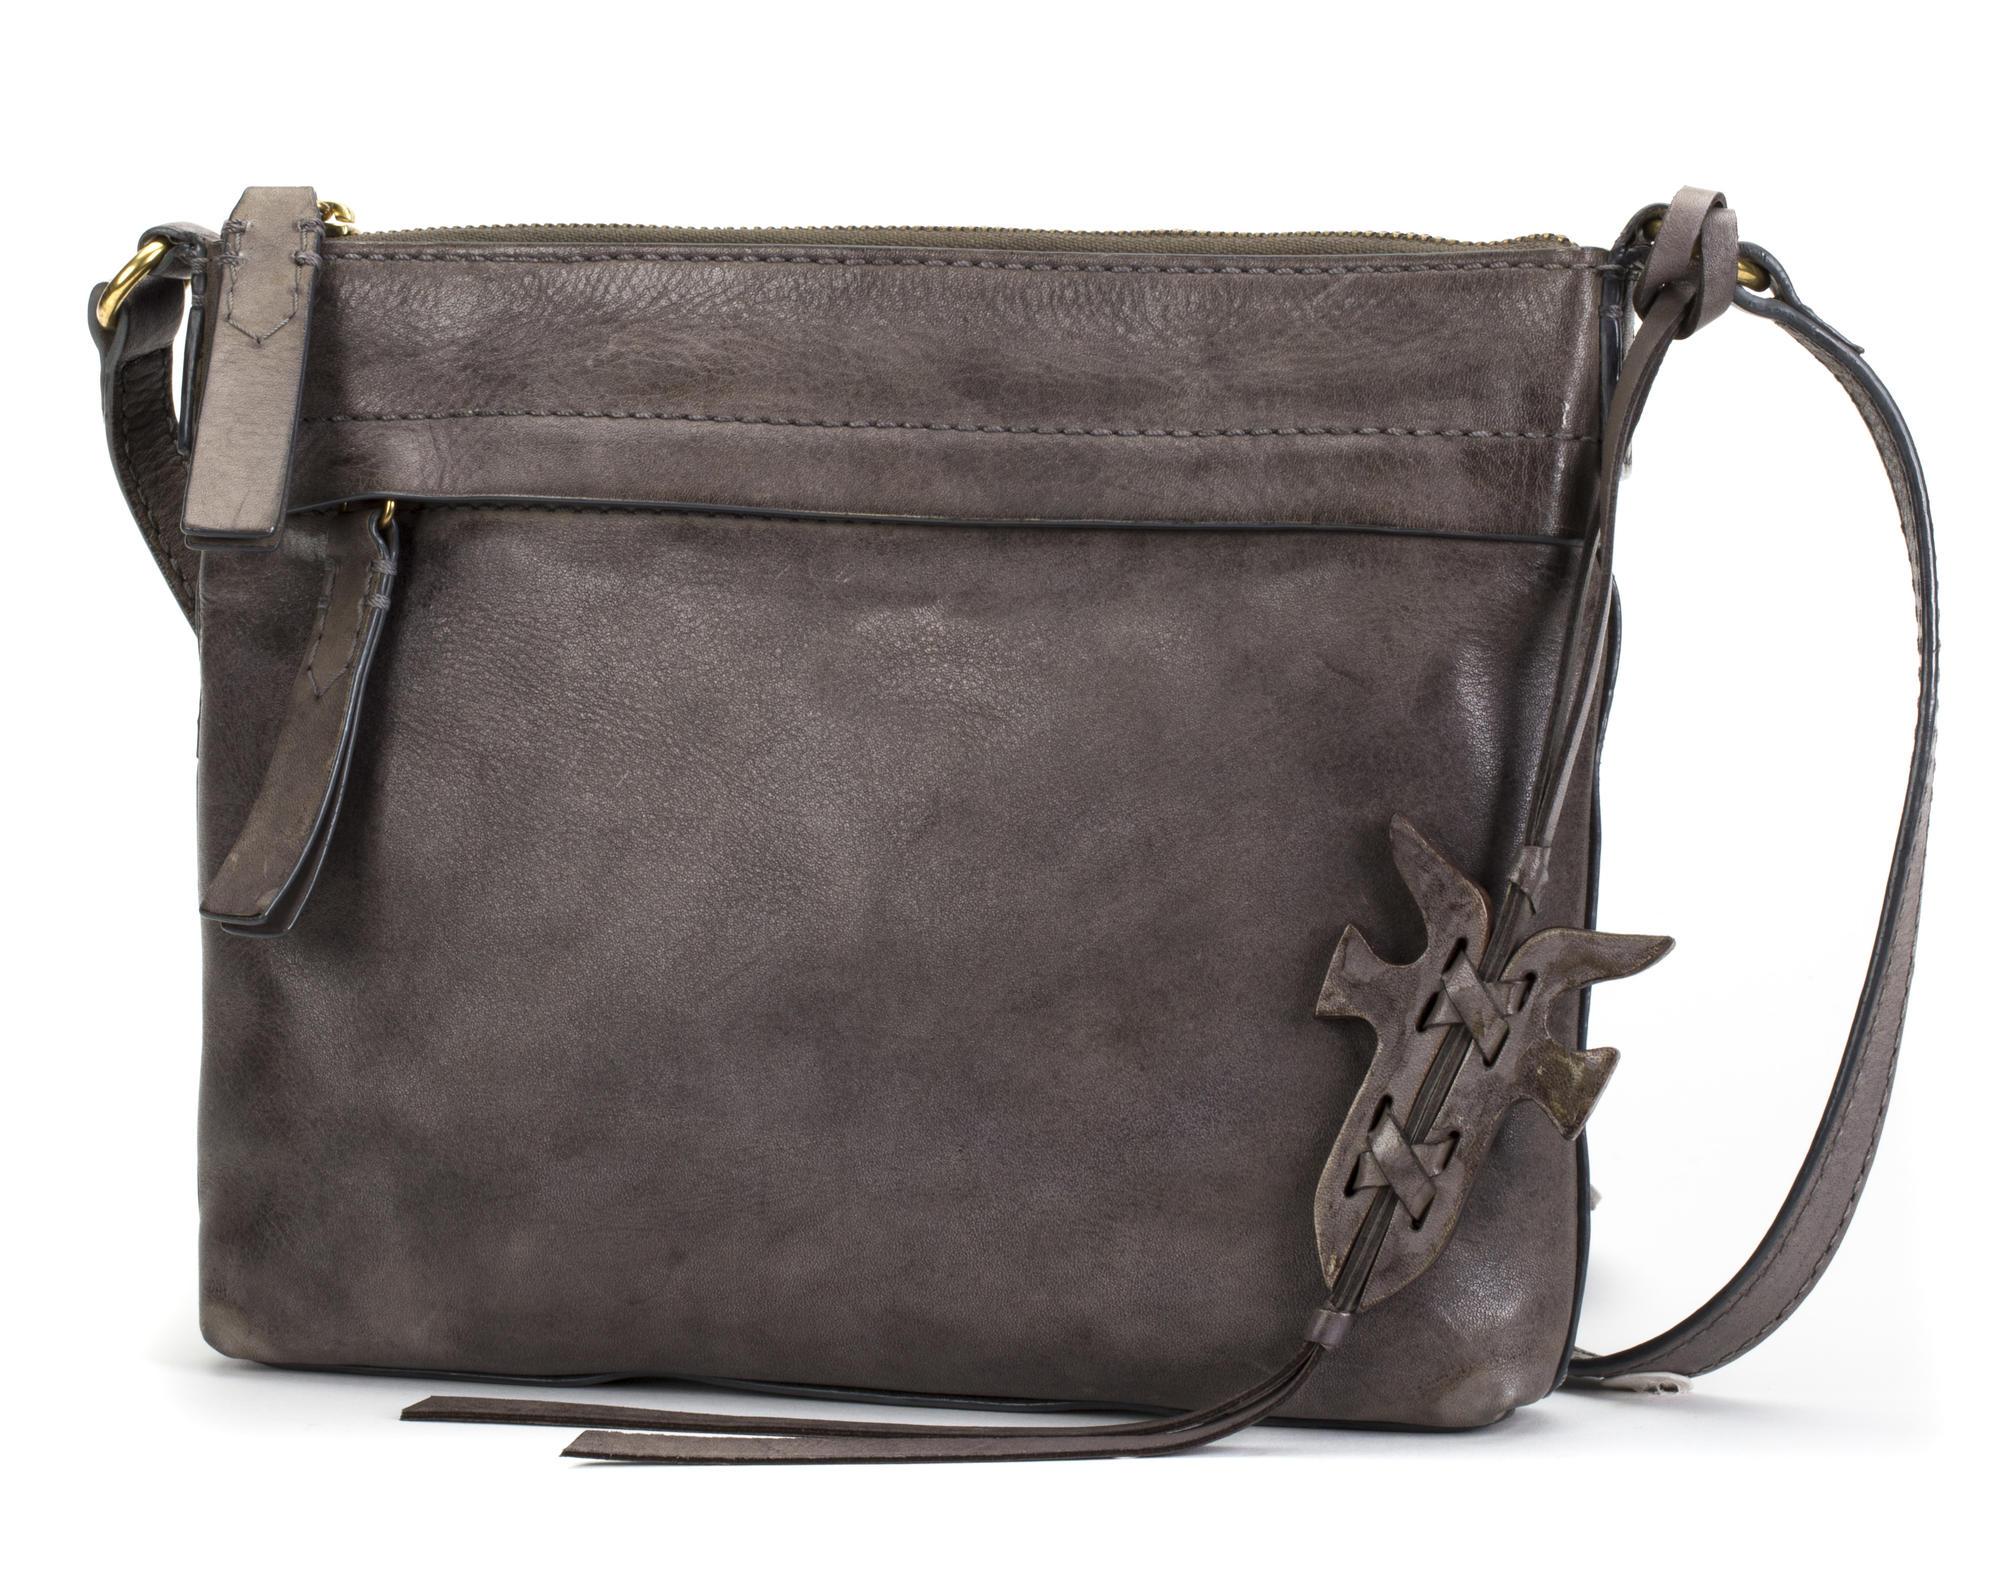 a6496016eb5e56 Frye Carson Crossbody Bag - Women's 34DB0105-GRY with Free S&H ...